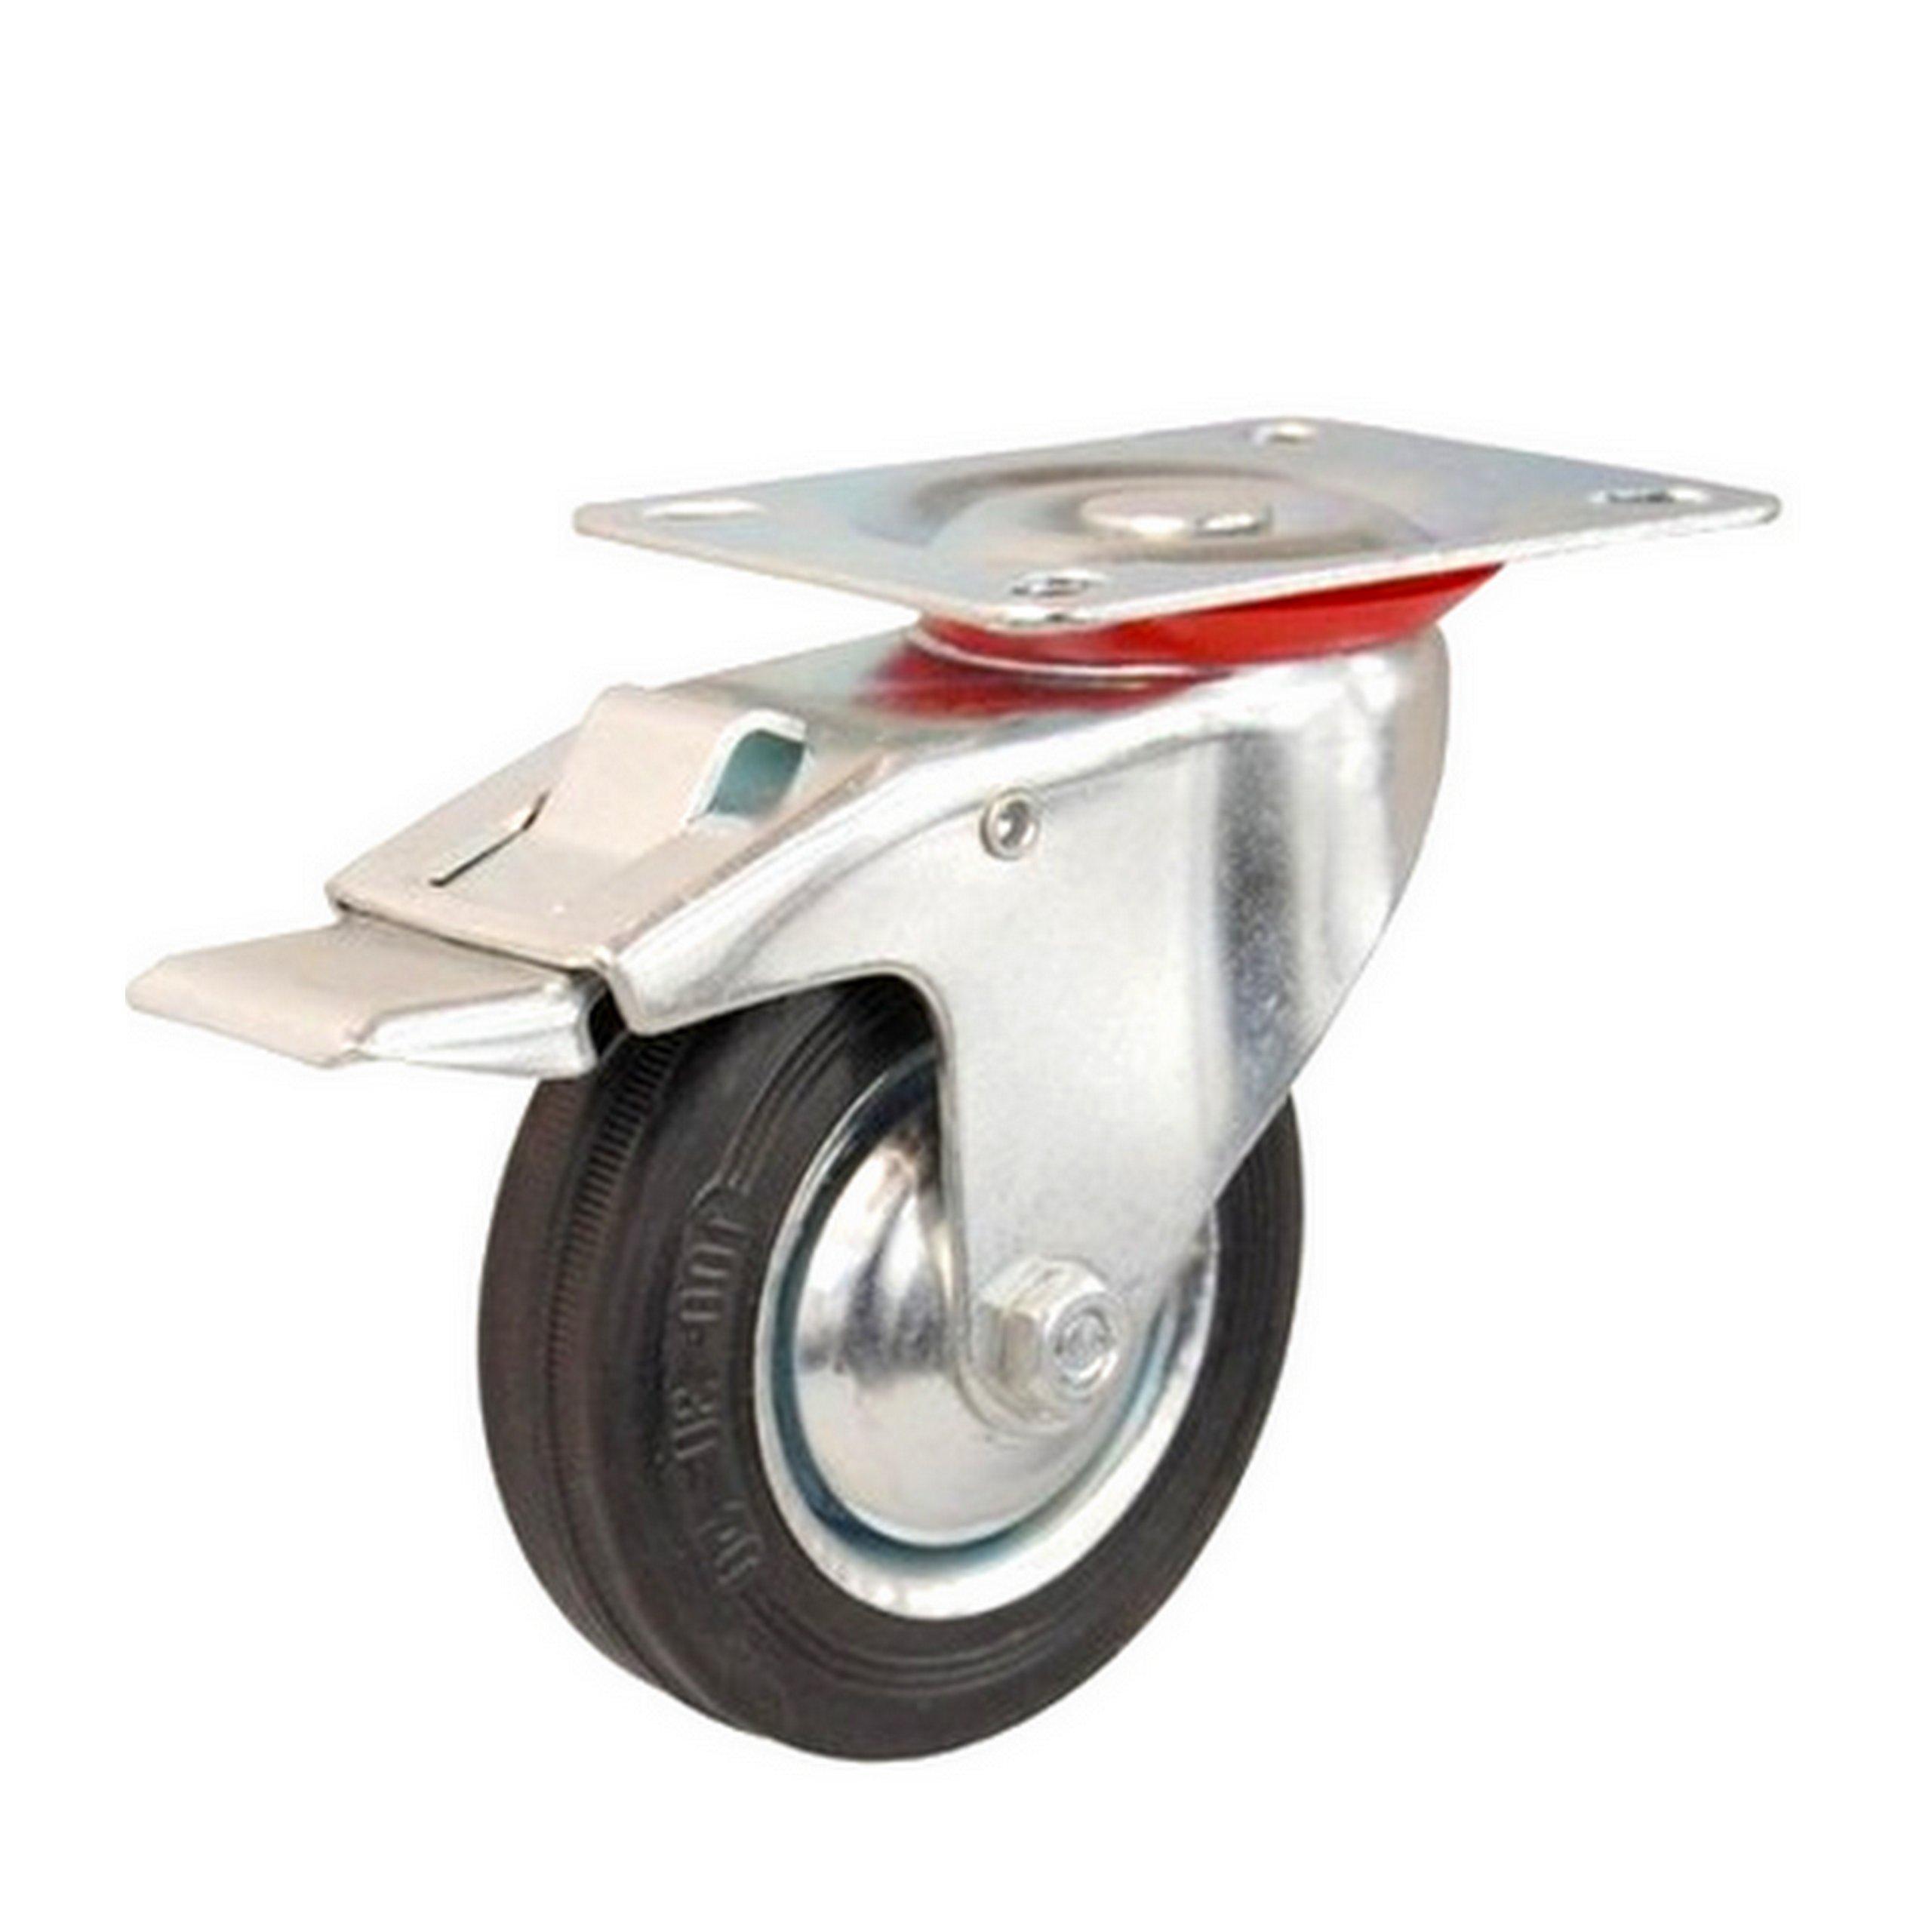 КОЛЕСО ПОВОРОТНЫЕ на ТОРМОЗ, 100мм КОЛЕСО ДЛЯ ТЕЛЕЖКИ колесо колес